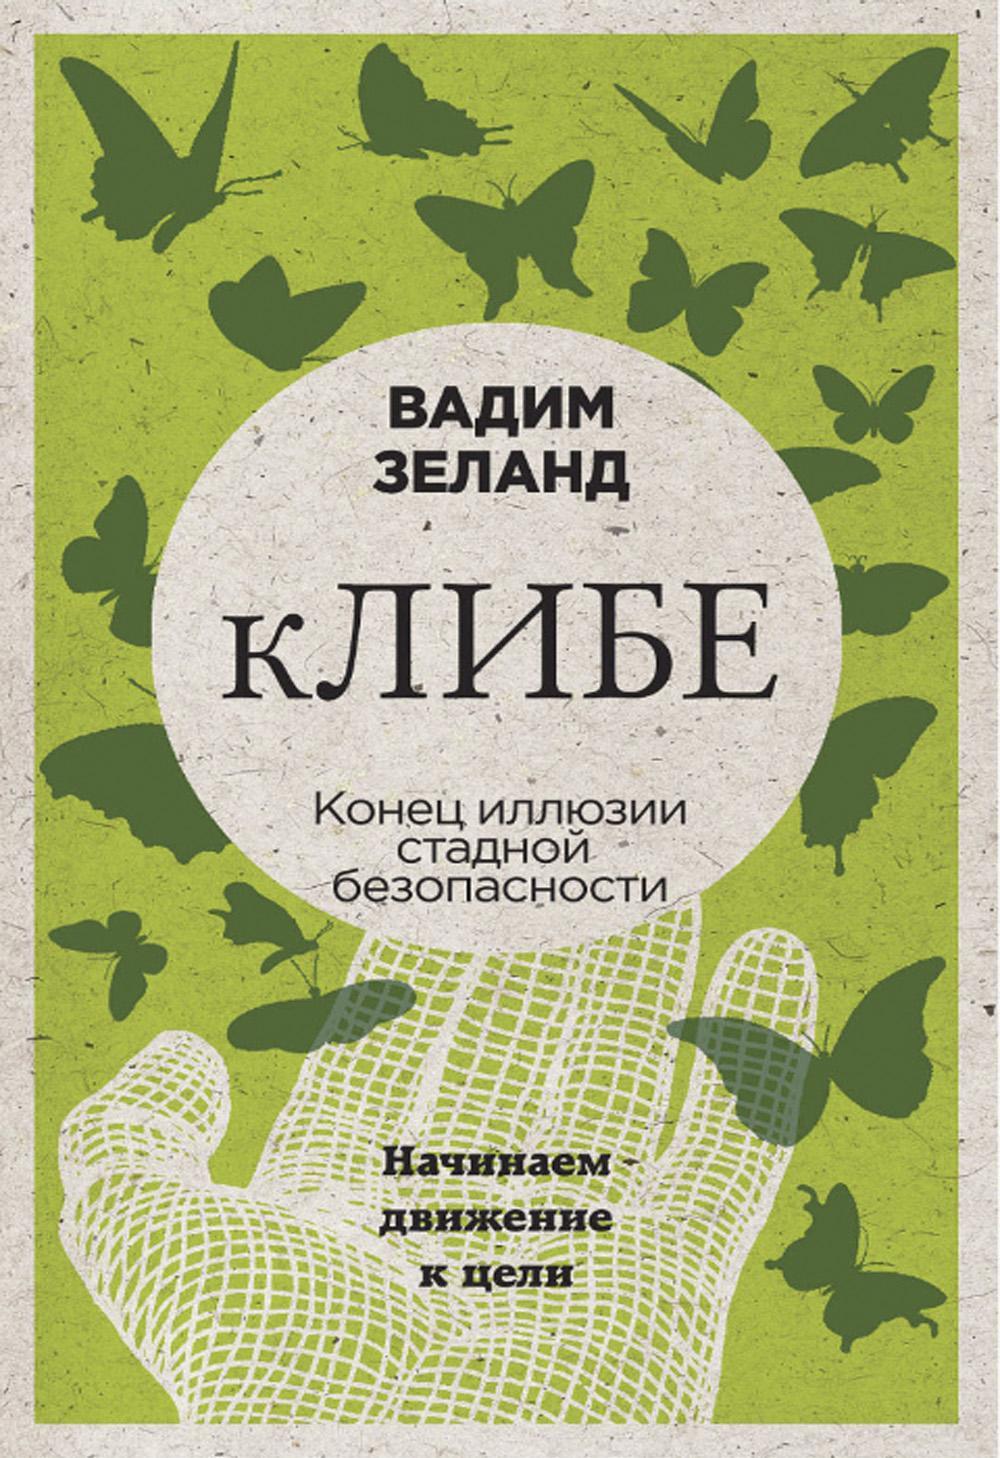 кЛИБЕ - Конец иллюзии стадной безопасности | Вадим Зеланд | Книга и аудиокнига